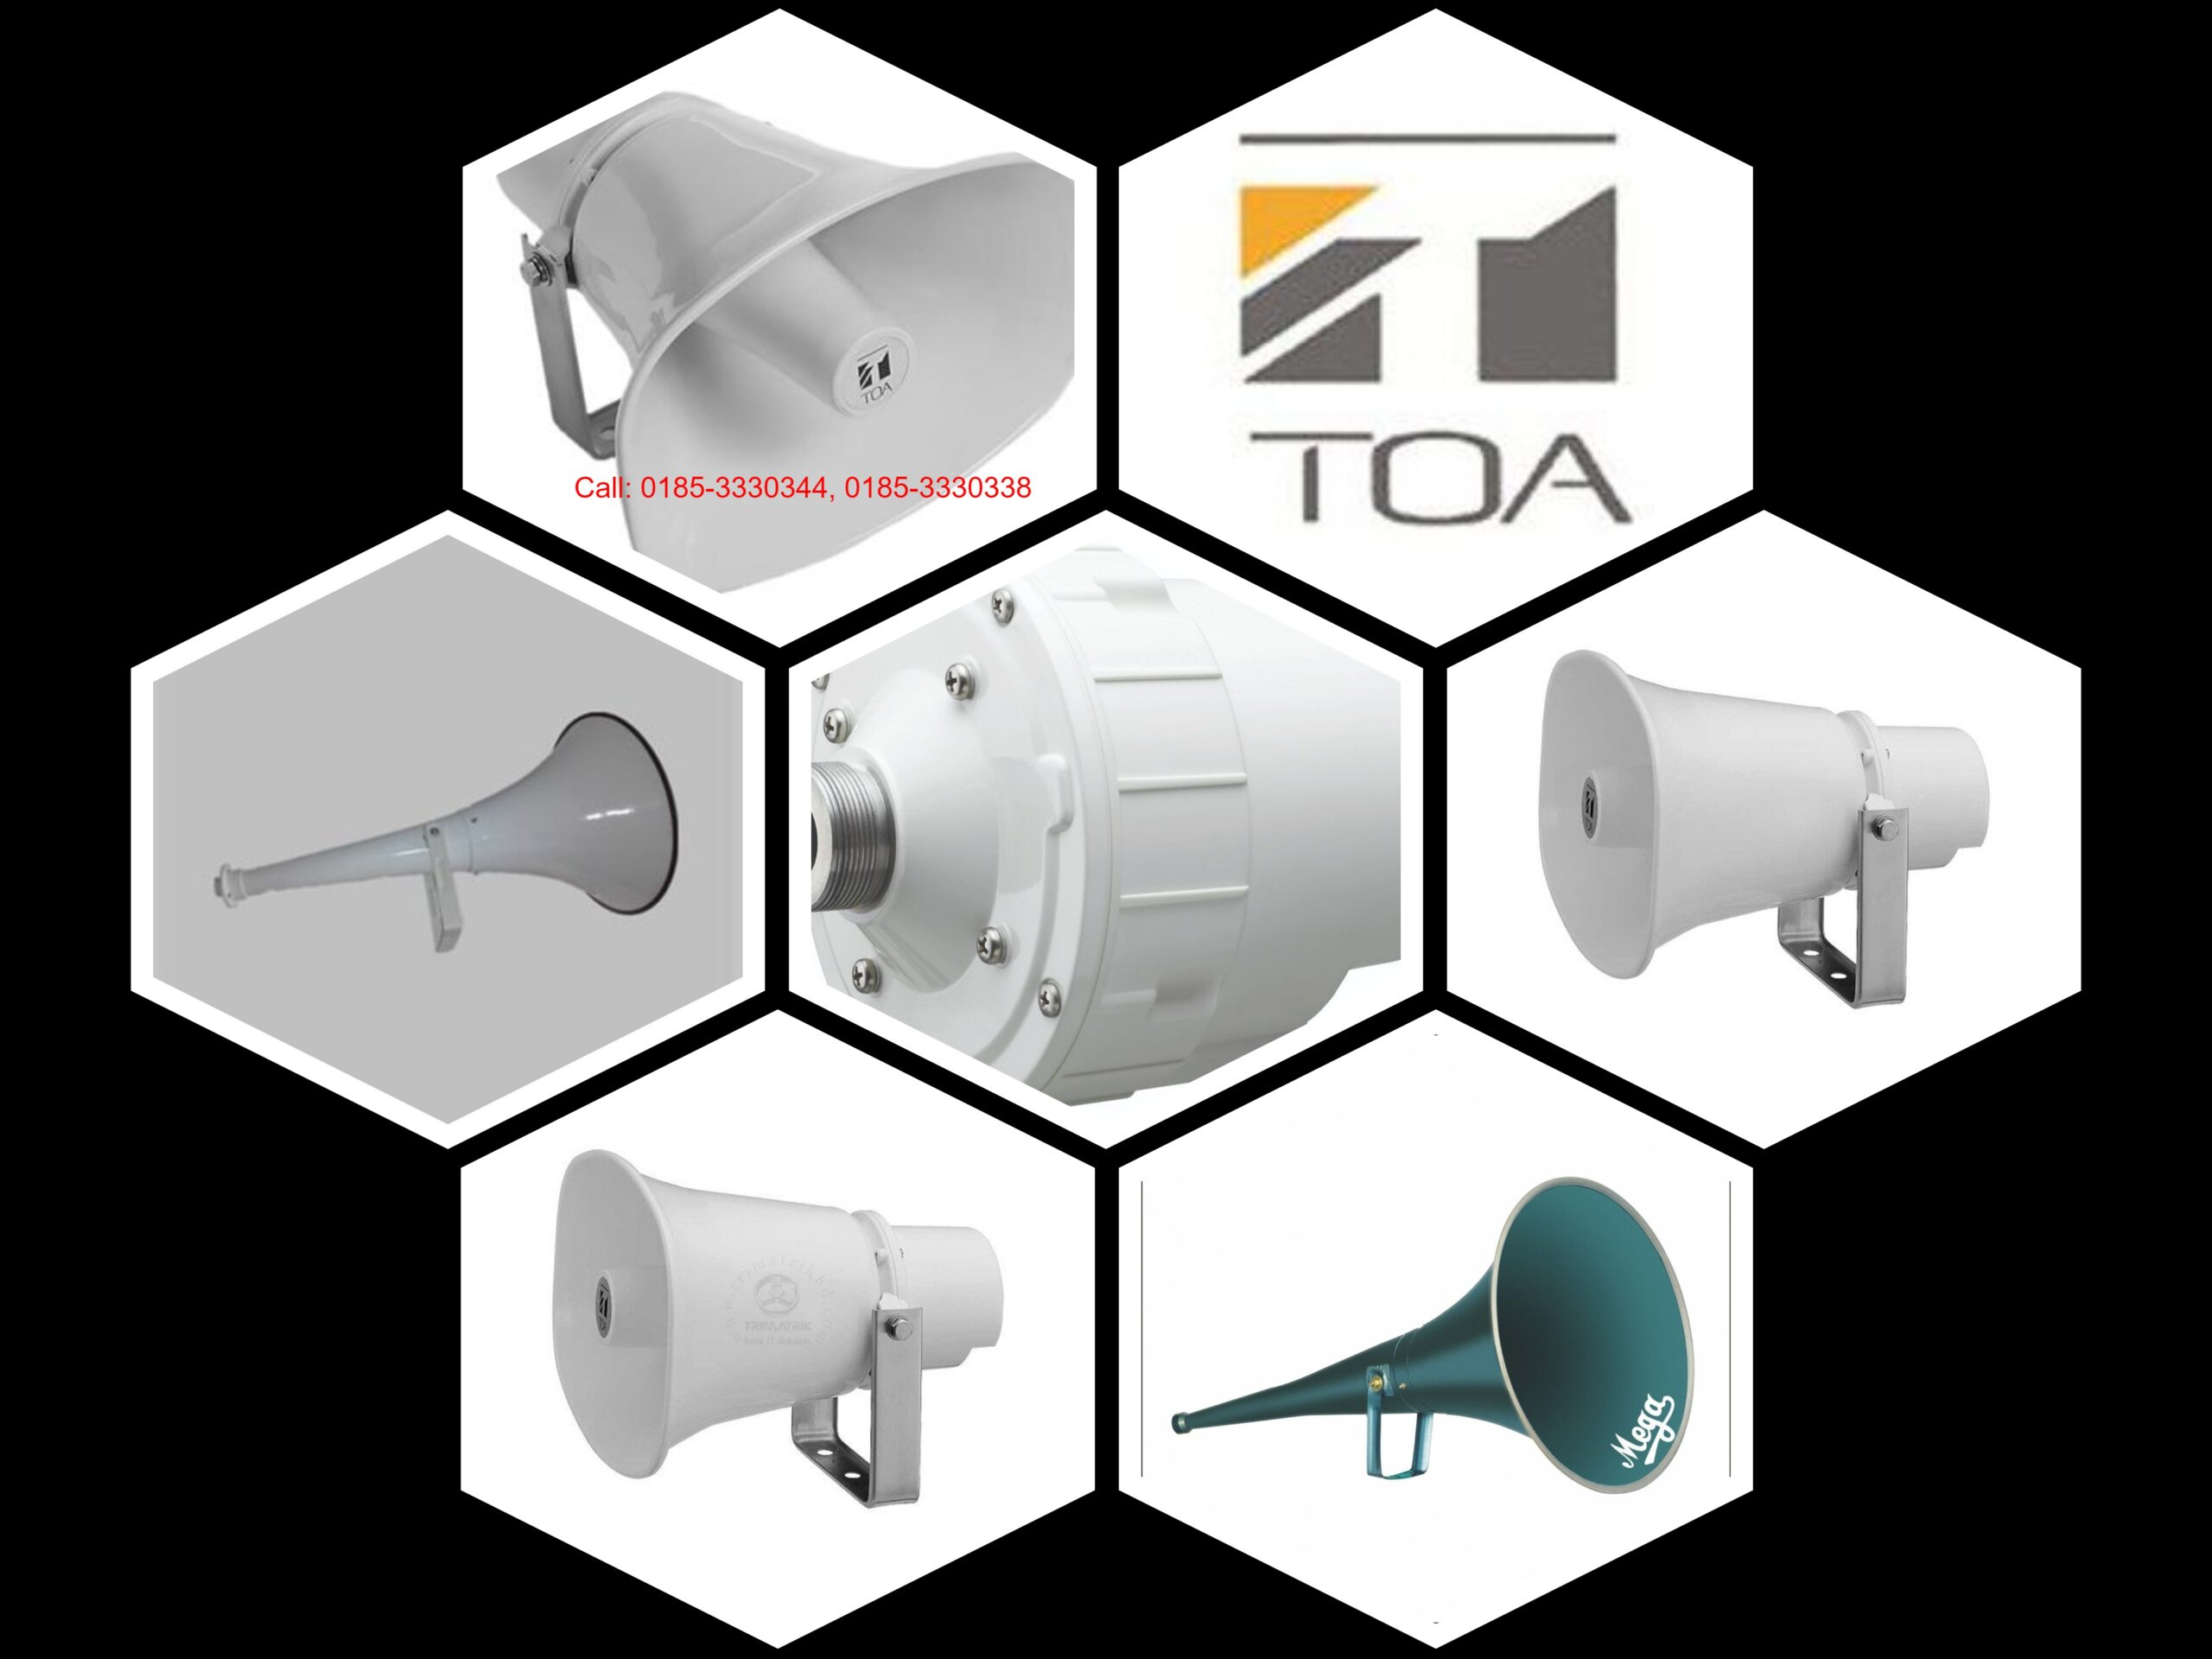 Toa sound system Bangladesh, Toa Bangladesh